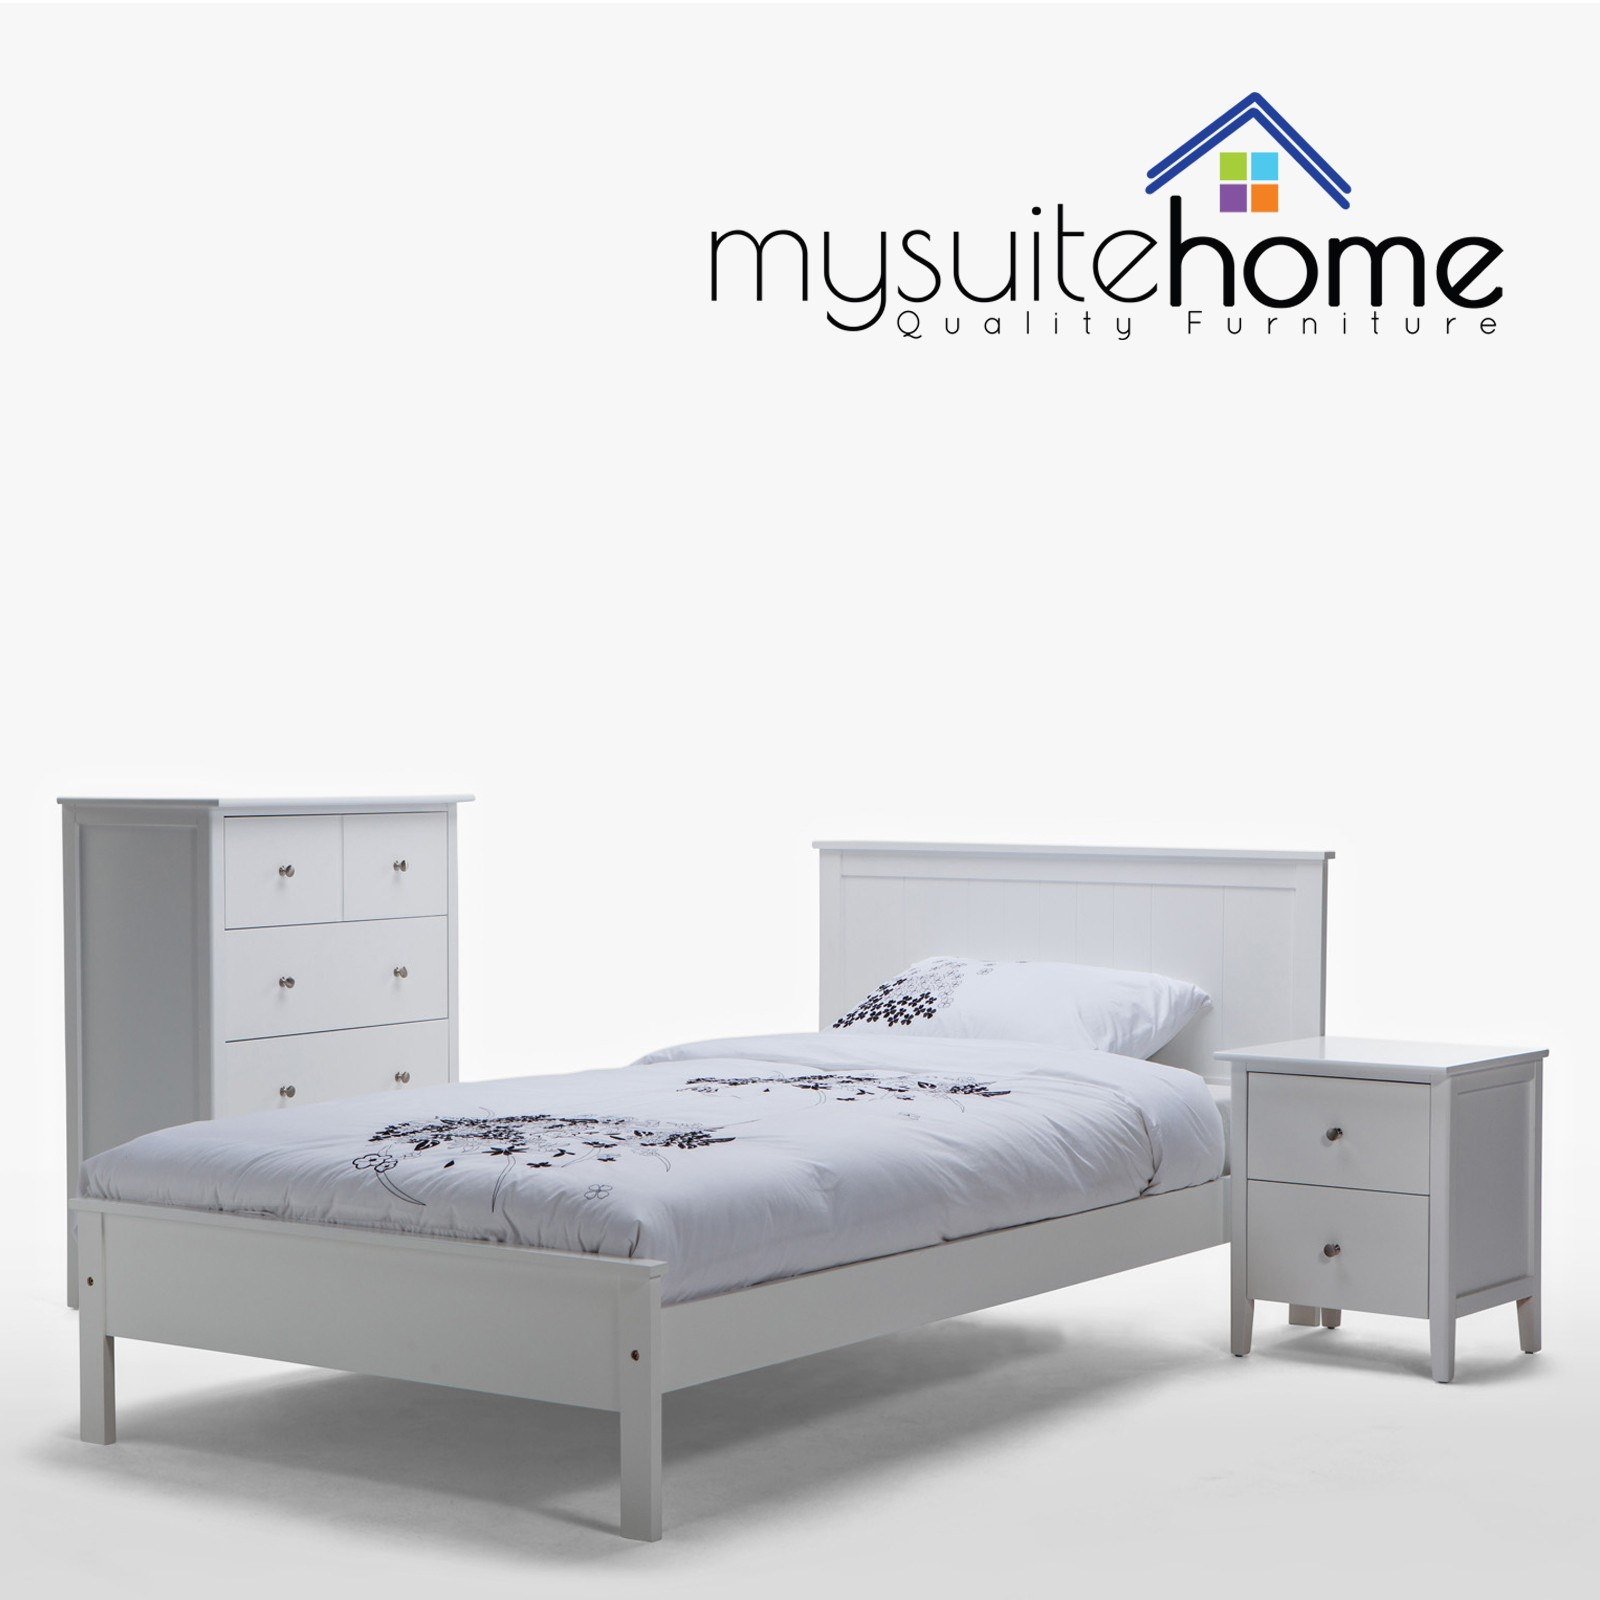 King single bed frame sydney - Rojo Brand New Matt White King Single Bed Frame 1 Bedside Table Tallboy